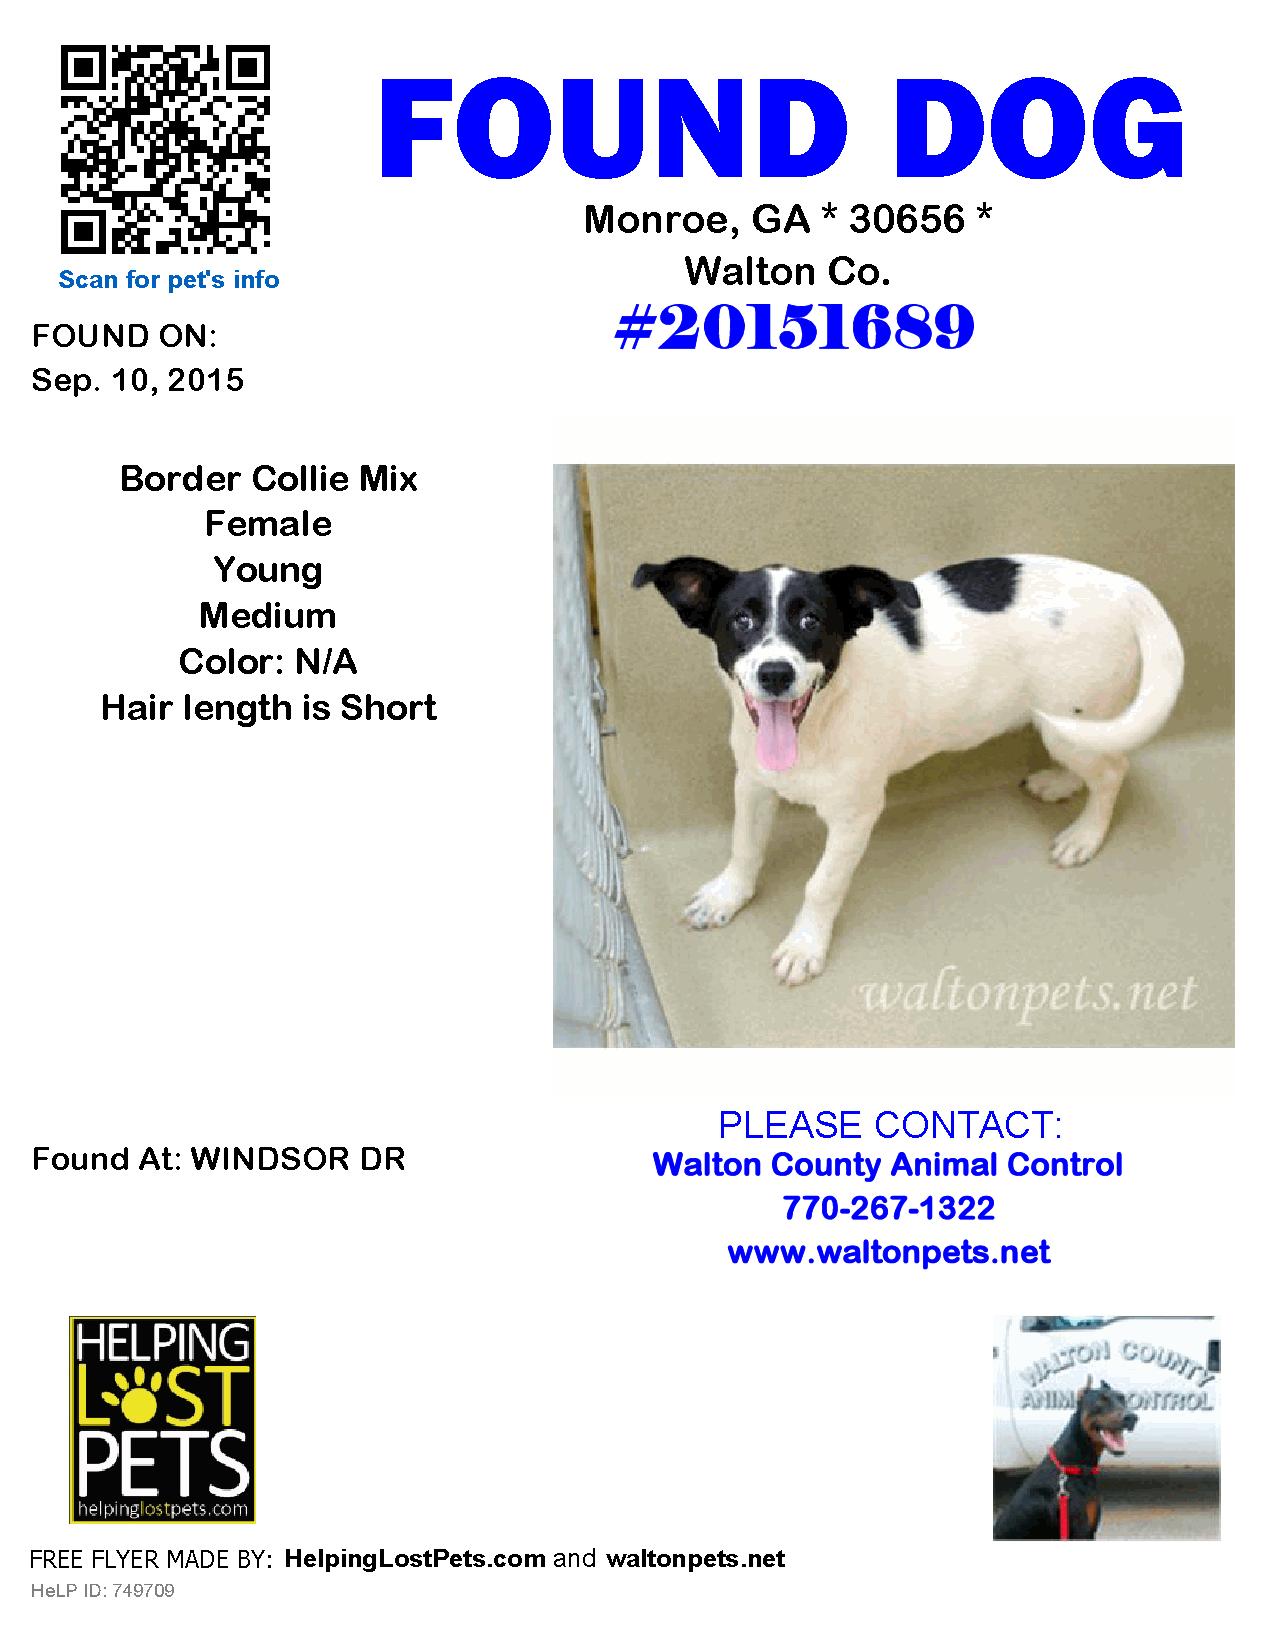 Found Dog Border Collie Monroe GA United States